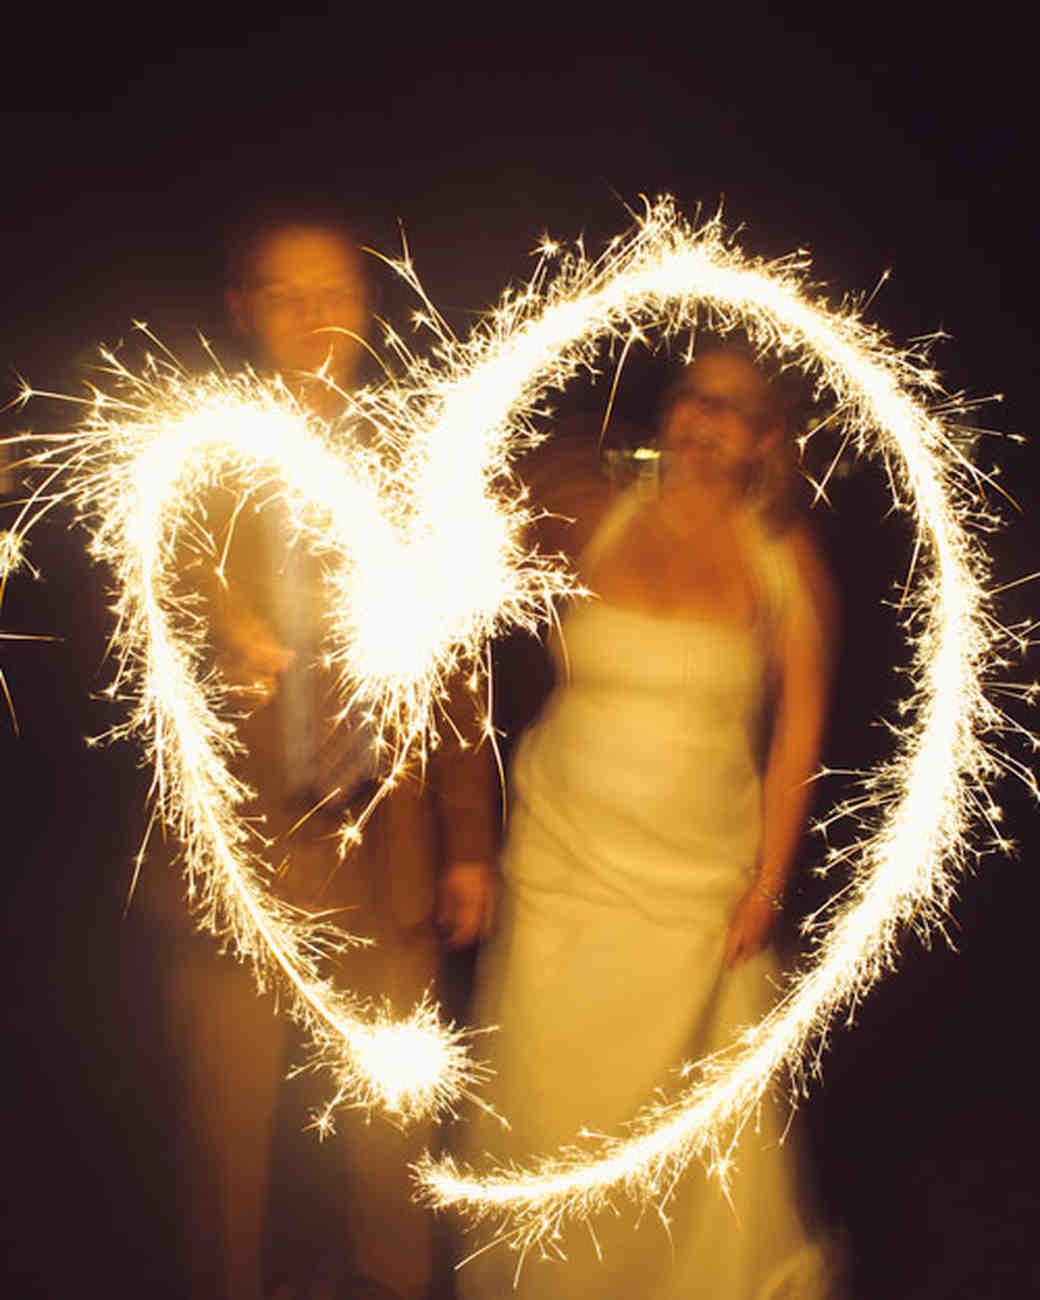 rw_0111_melissa_adam_sparklers.jpg